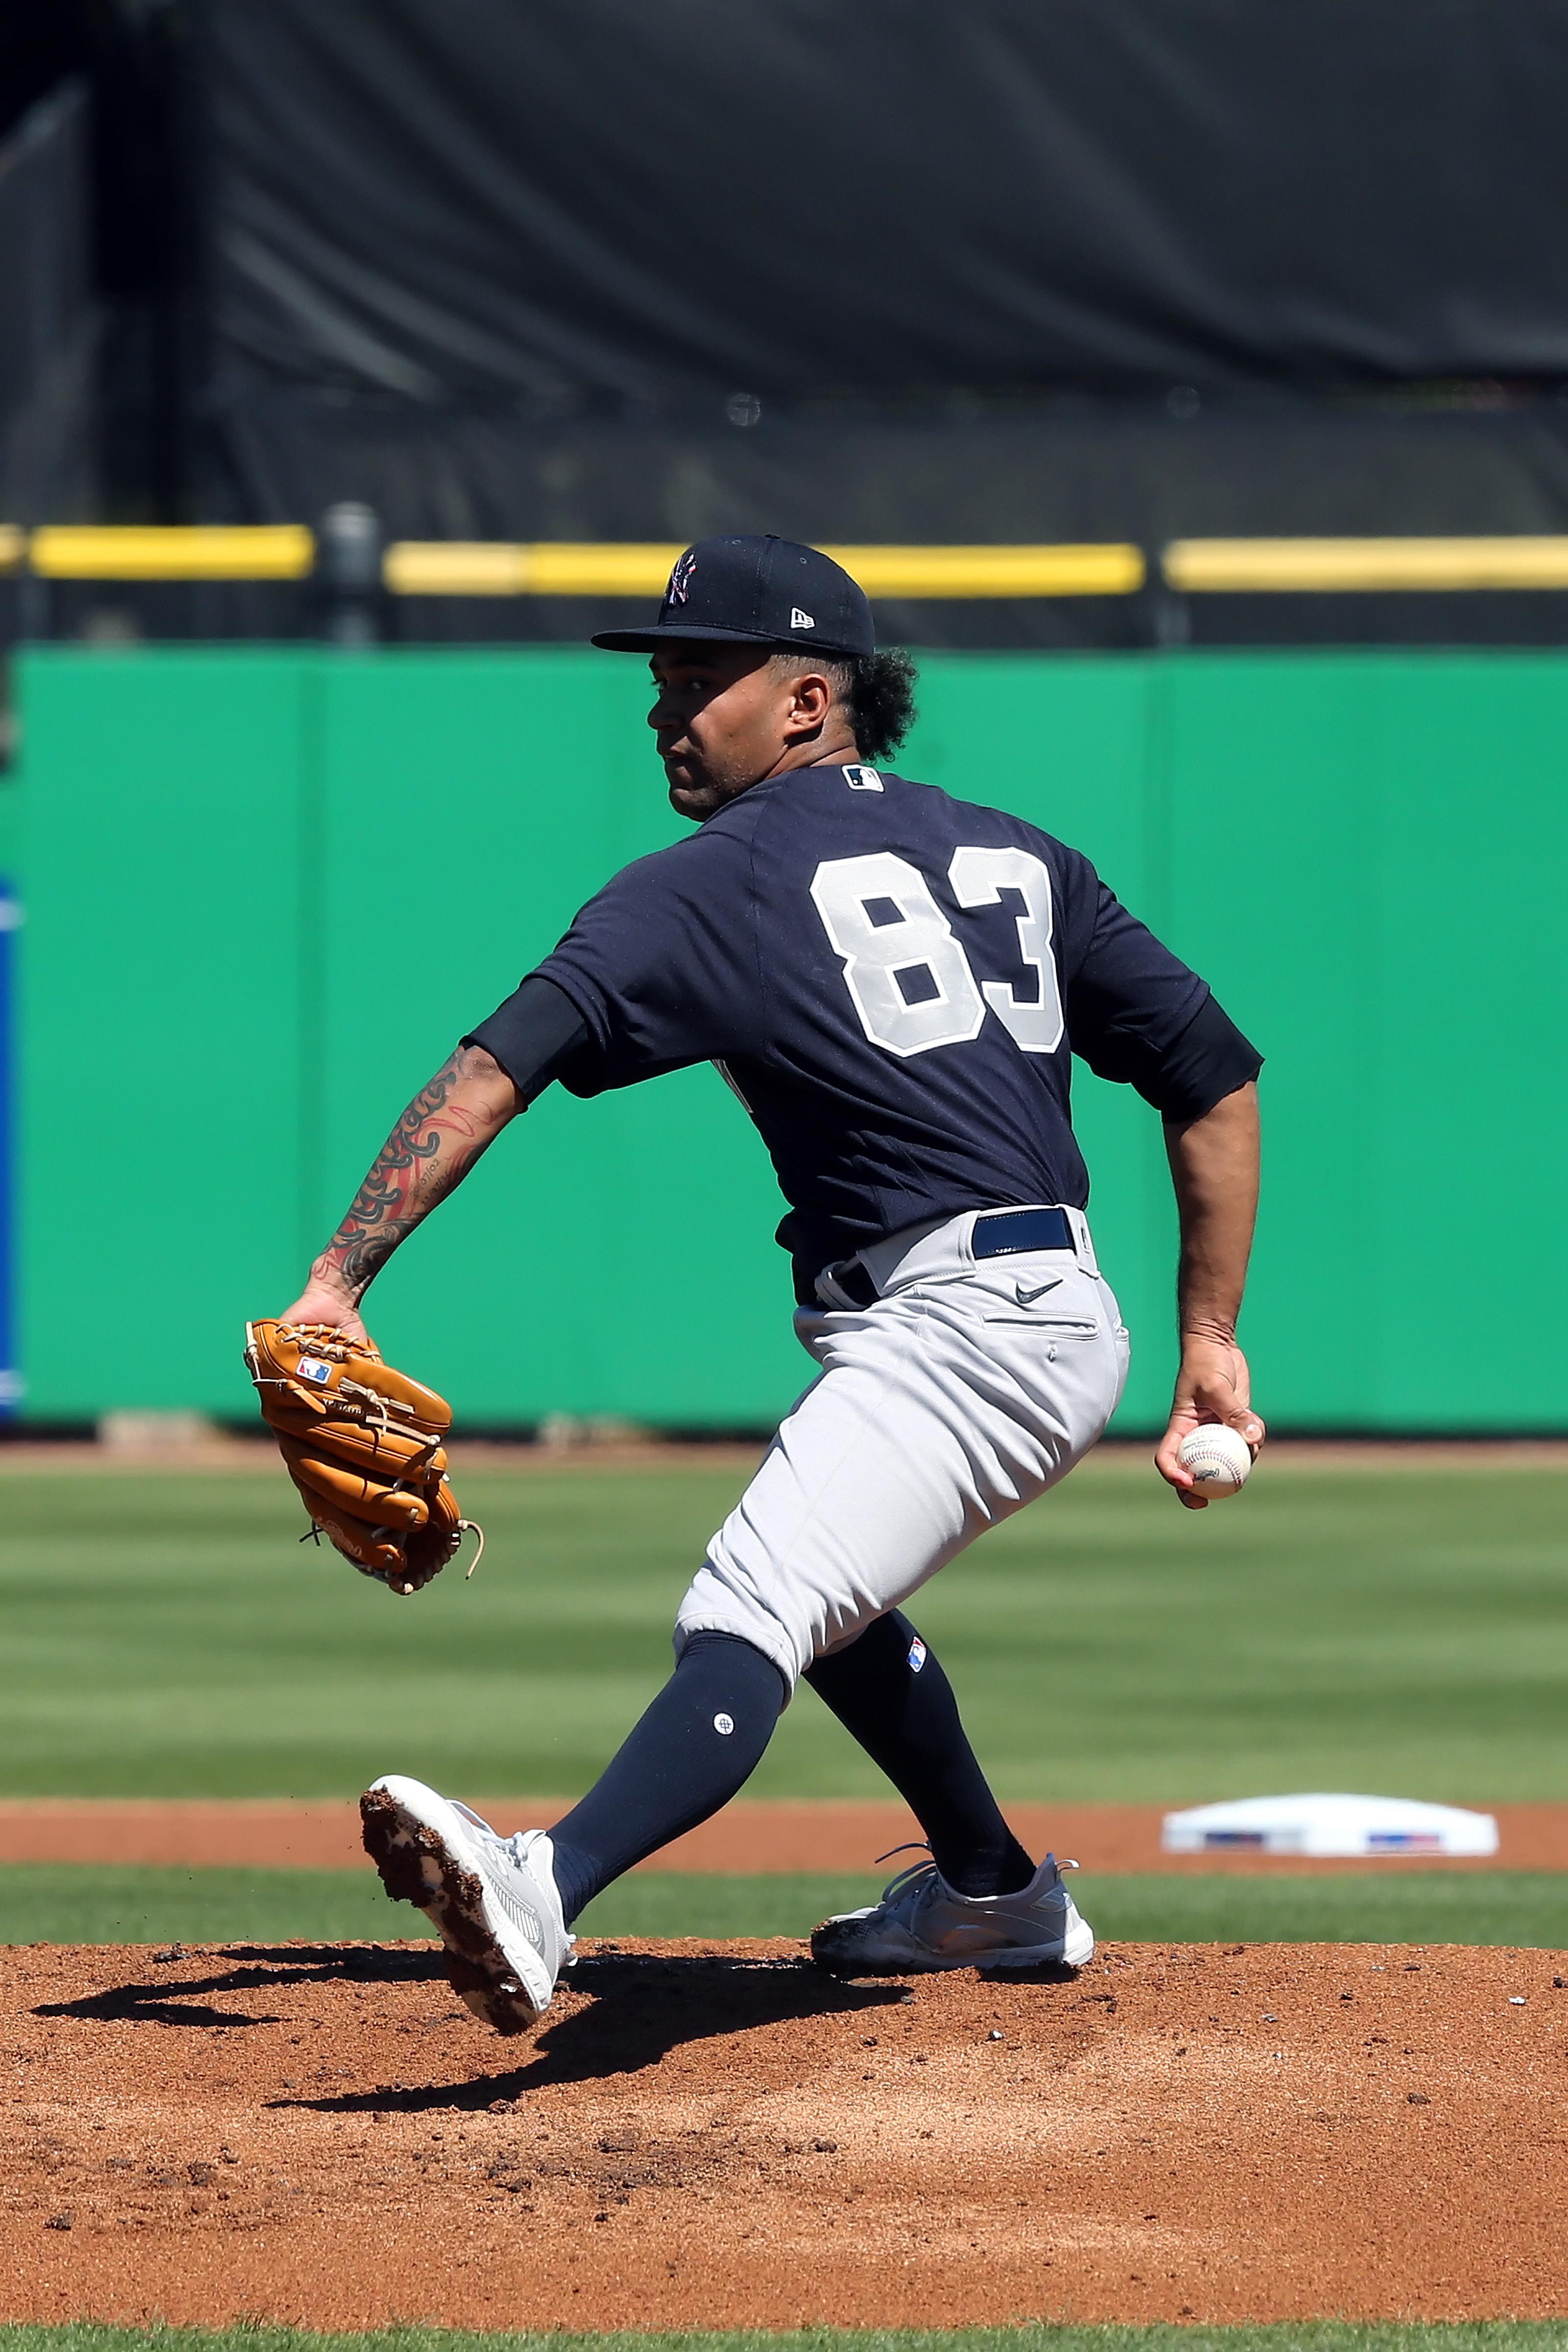 MLB: MAR 04 Spring Training - Yankees at Phillies